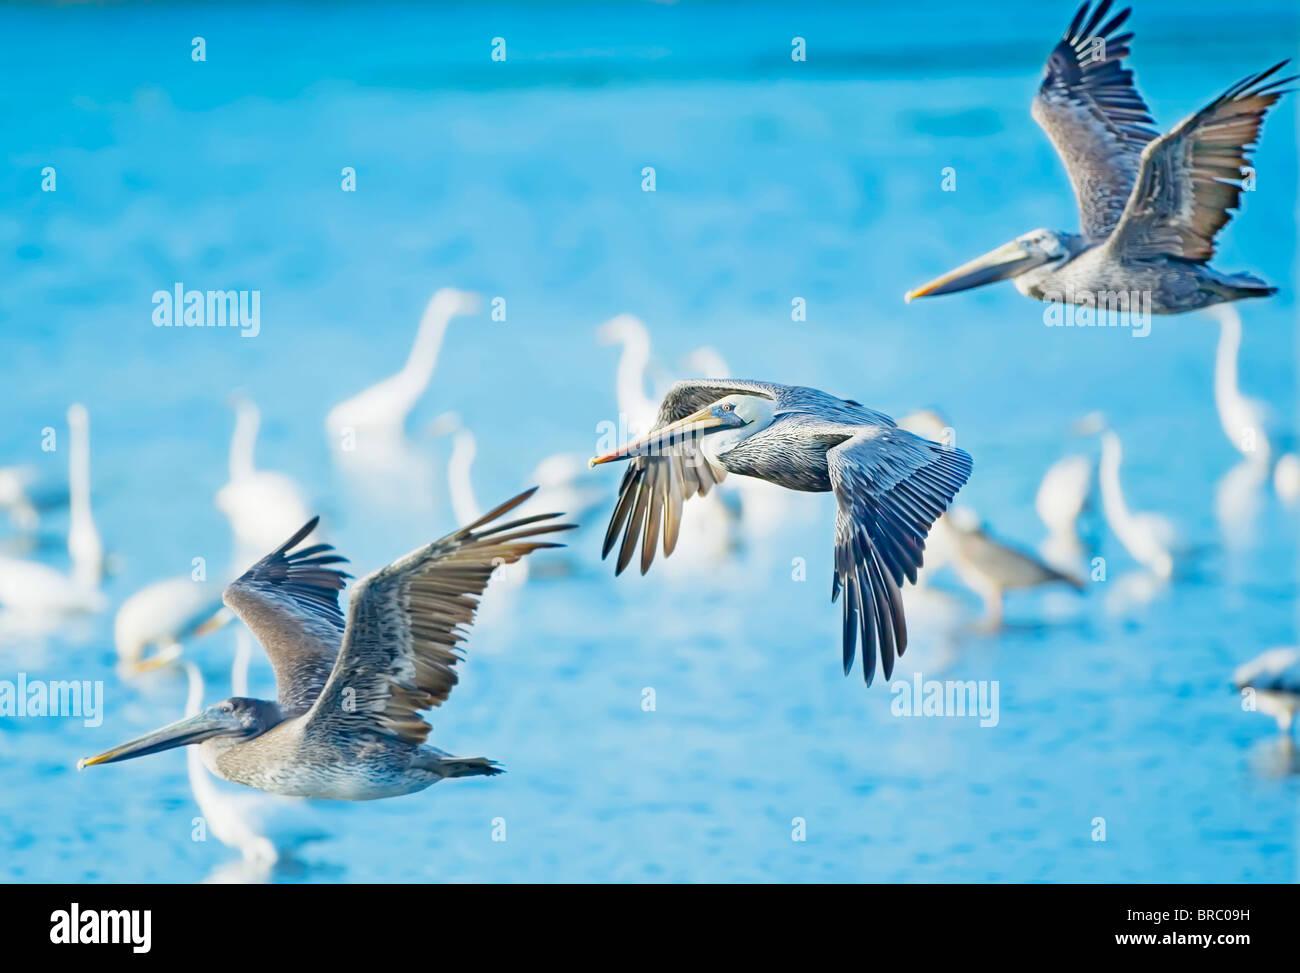 Brown Pelican (Pelecanus occidentalis) in flight, Sanibel Island, J. N. Ding Darling National Wildlife Refuge, Florida, - Stock Image